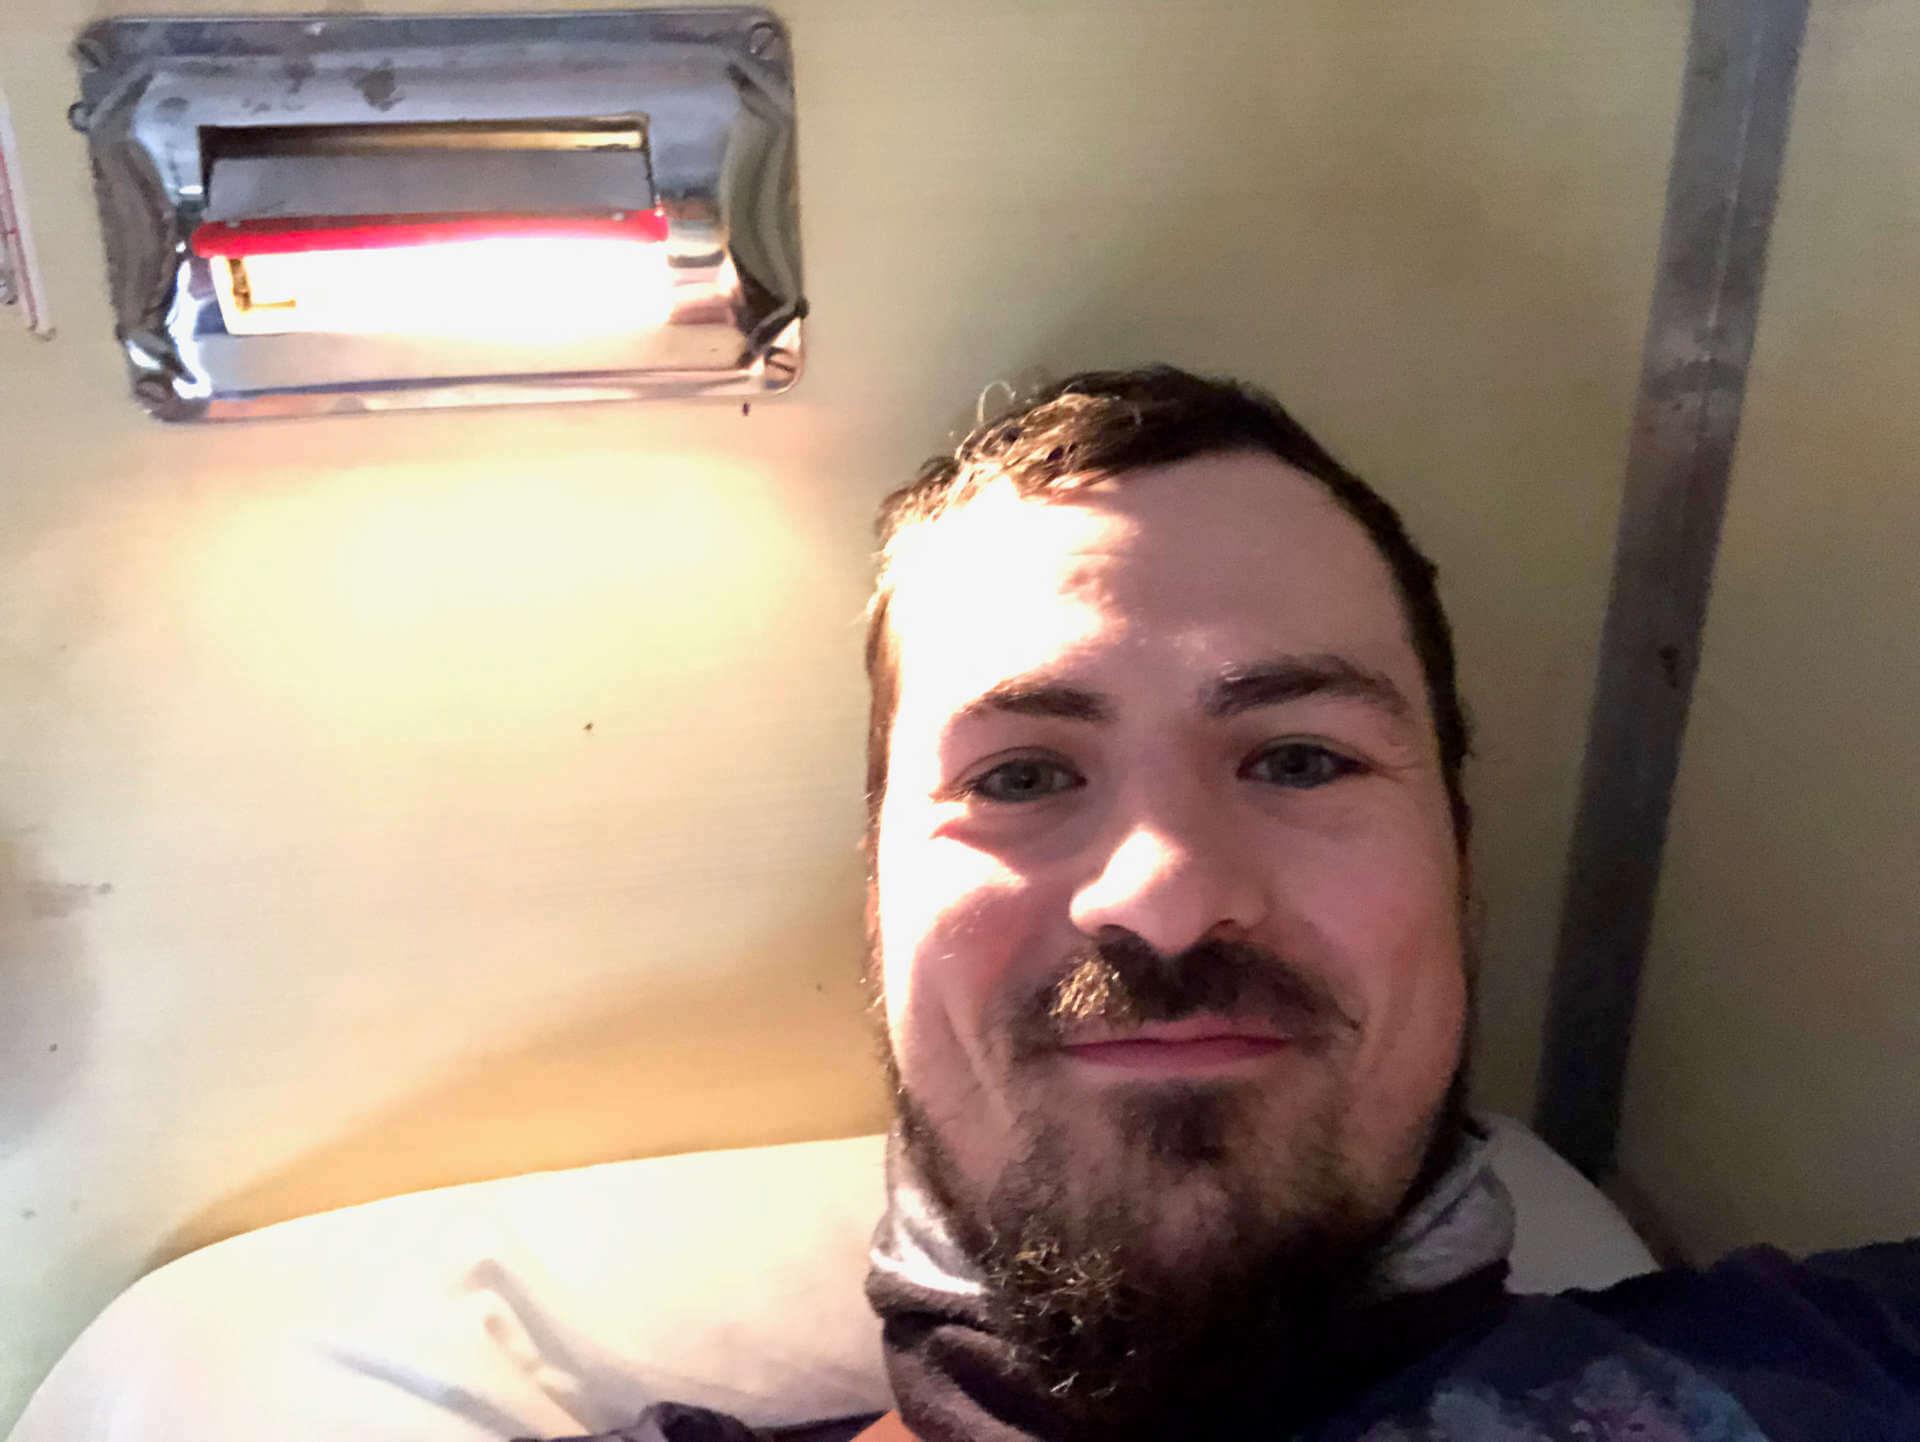 Leselampe im Zug AC2